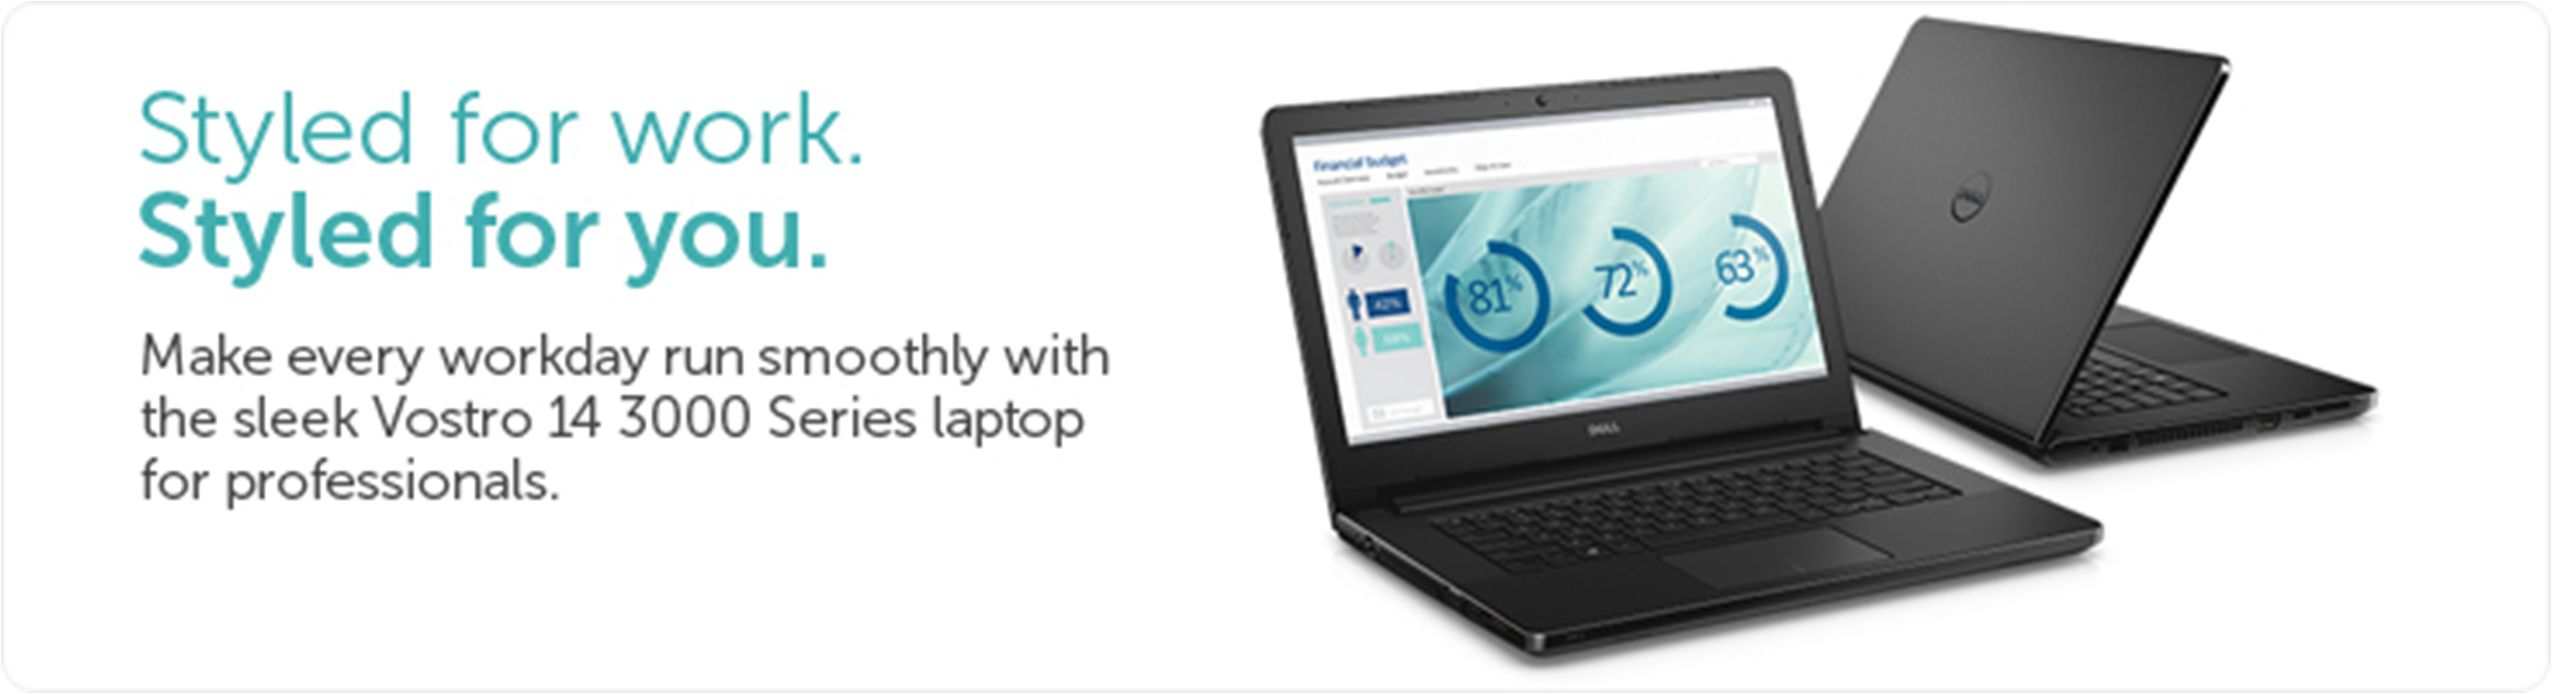 Vostro Laptop